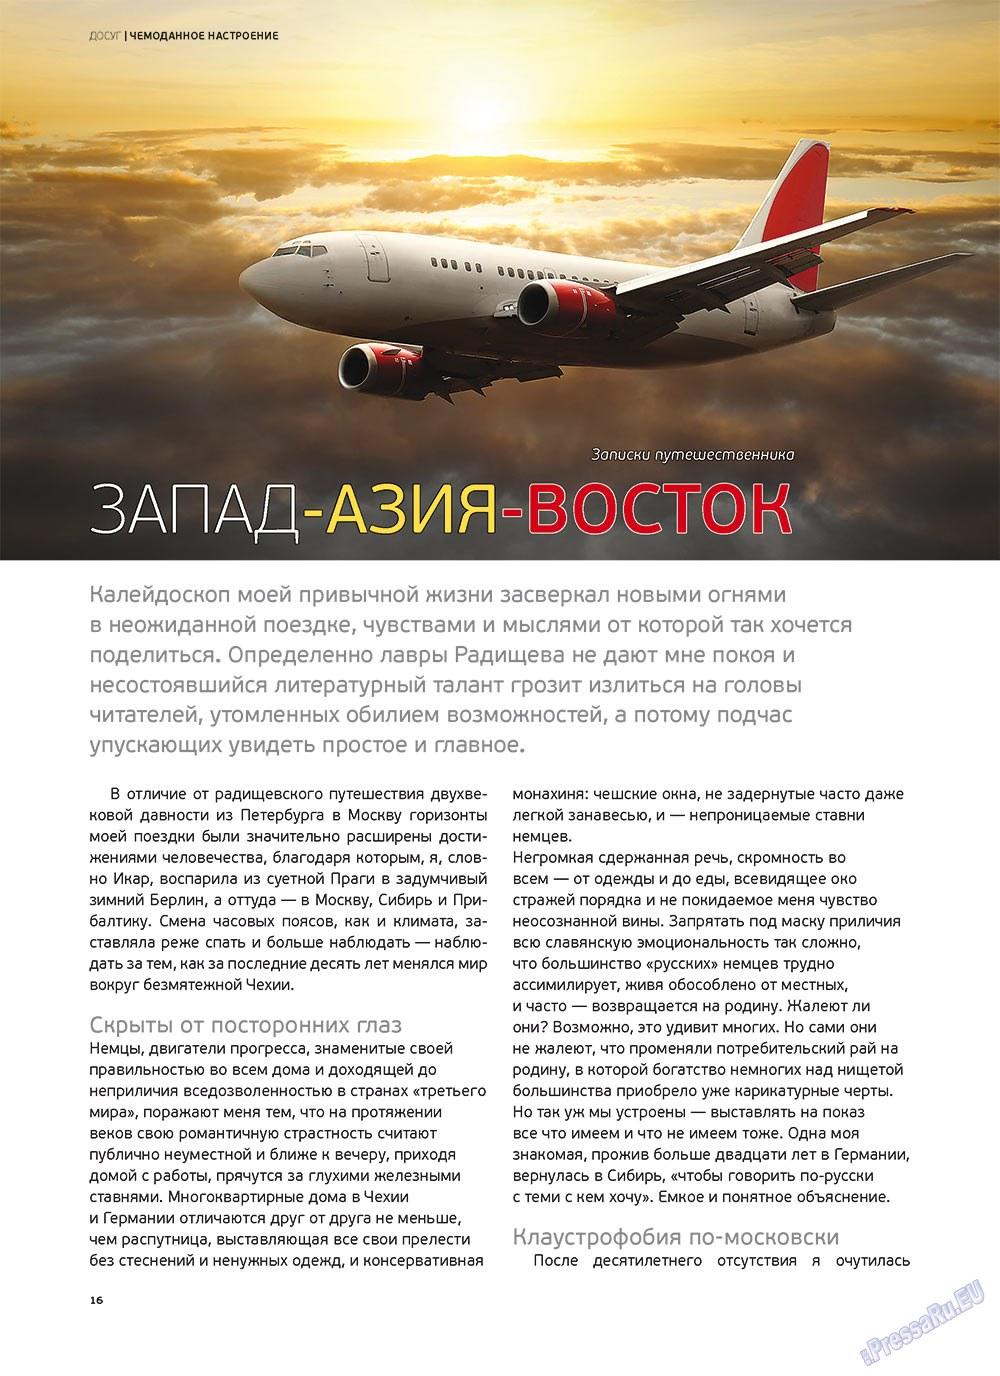 Артек (журнал). 2011 год, номер 6, стр. 18